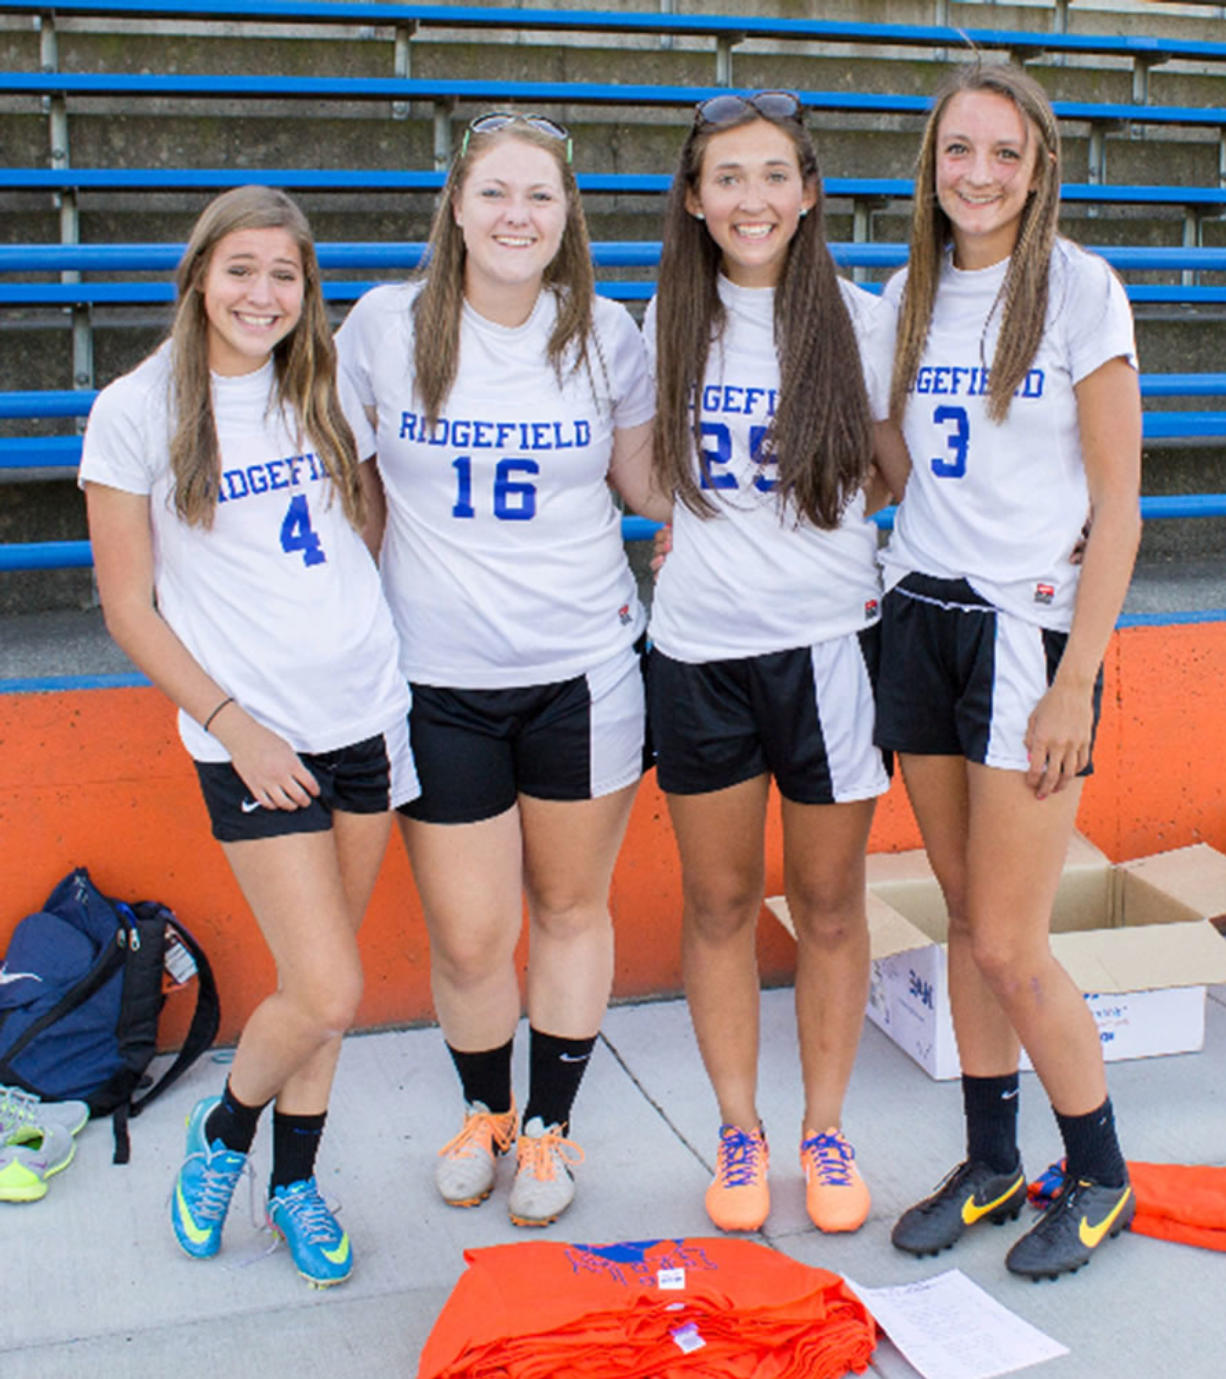 Ridgefield High School Girls Take Charge Of Summer Soccer Camp - Columbiancom-9542